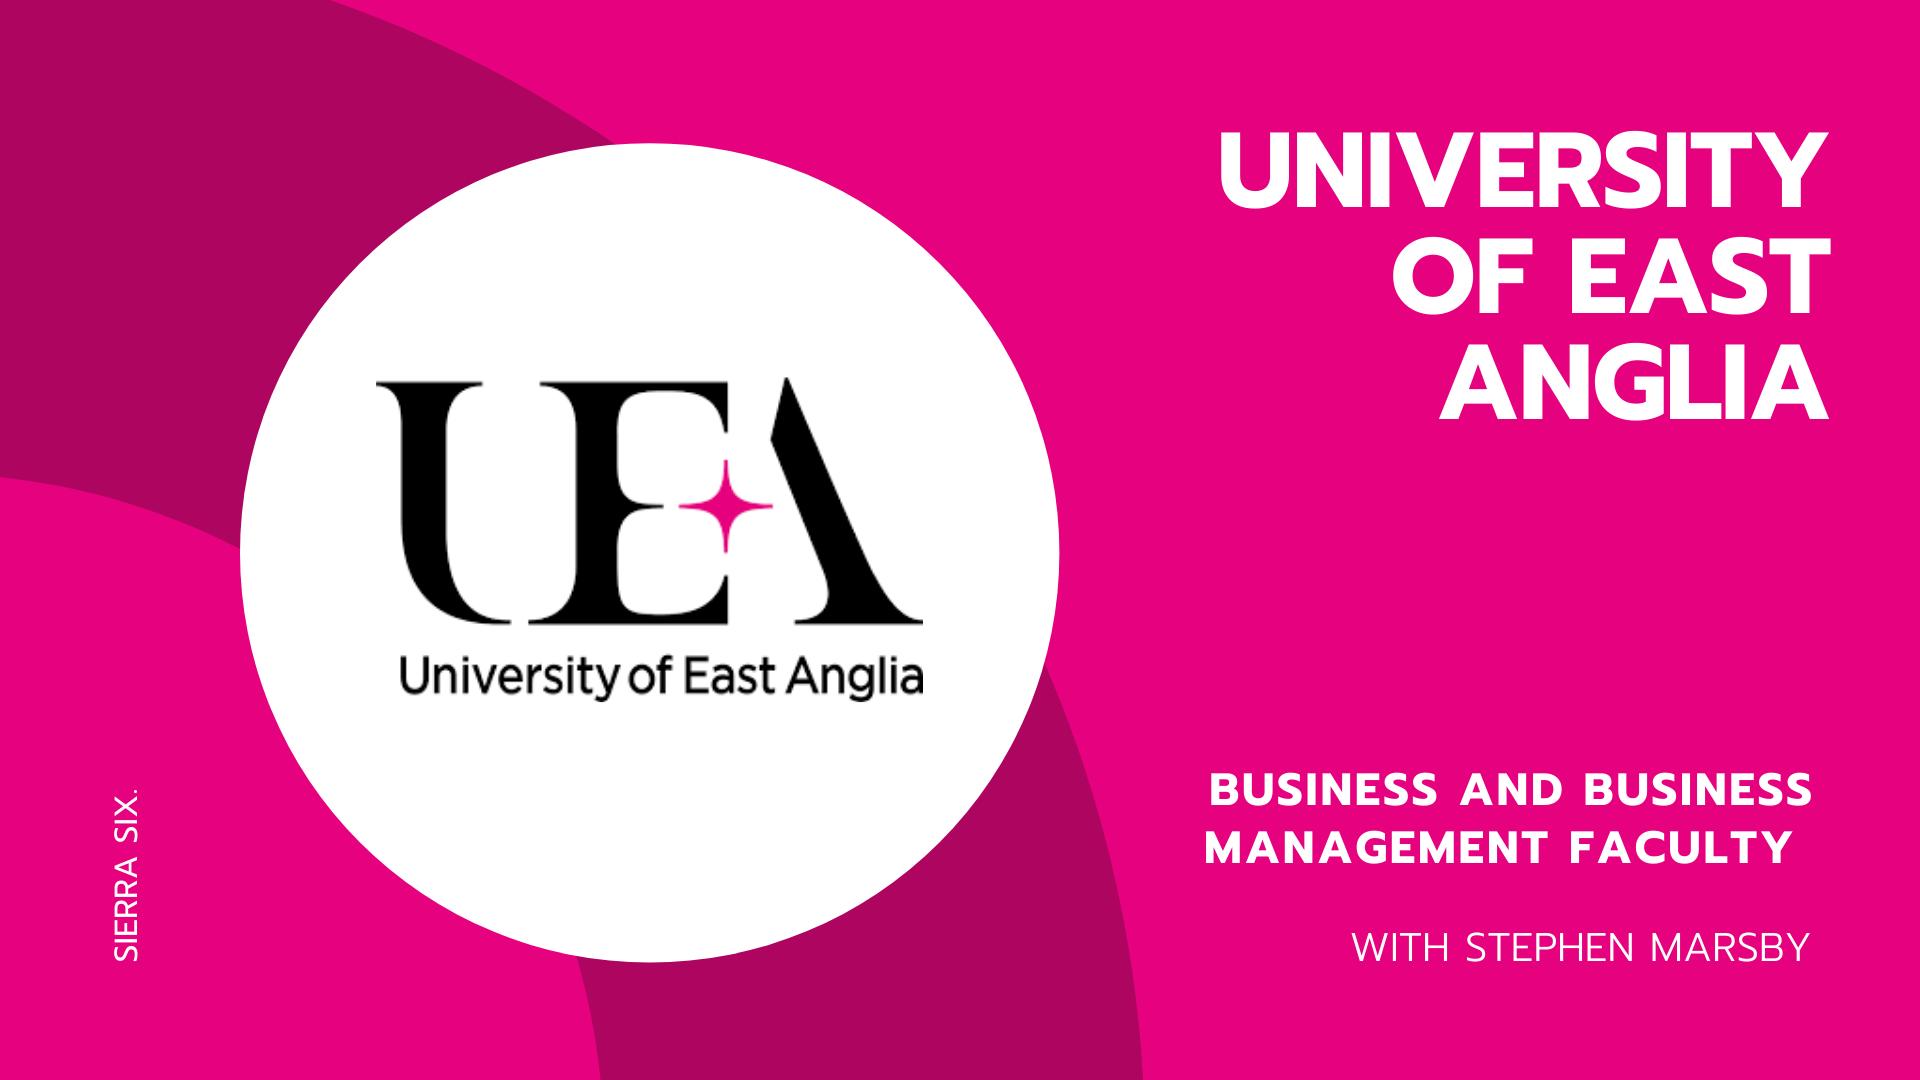 Sierra Six Media, SEO agency educational workshops: University of East Anglia